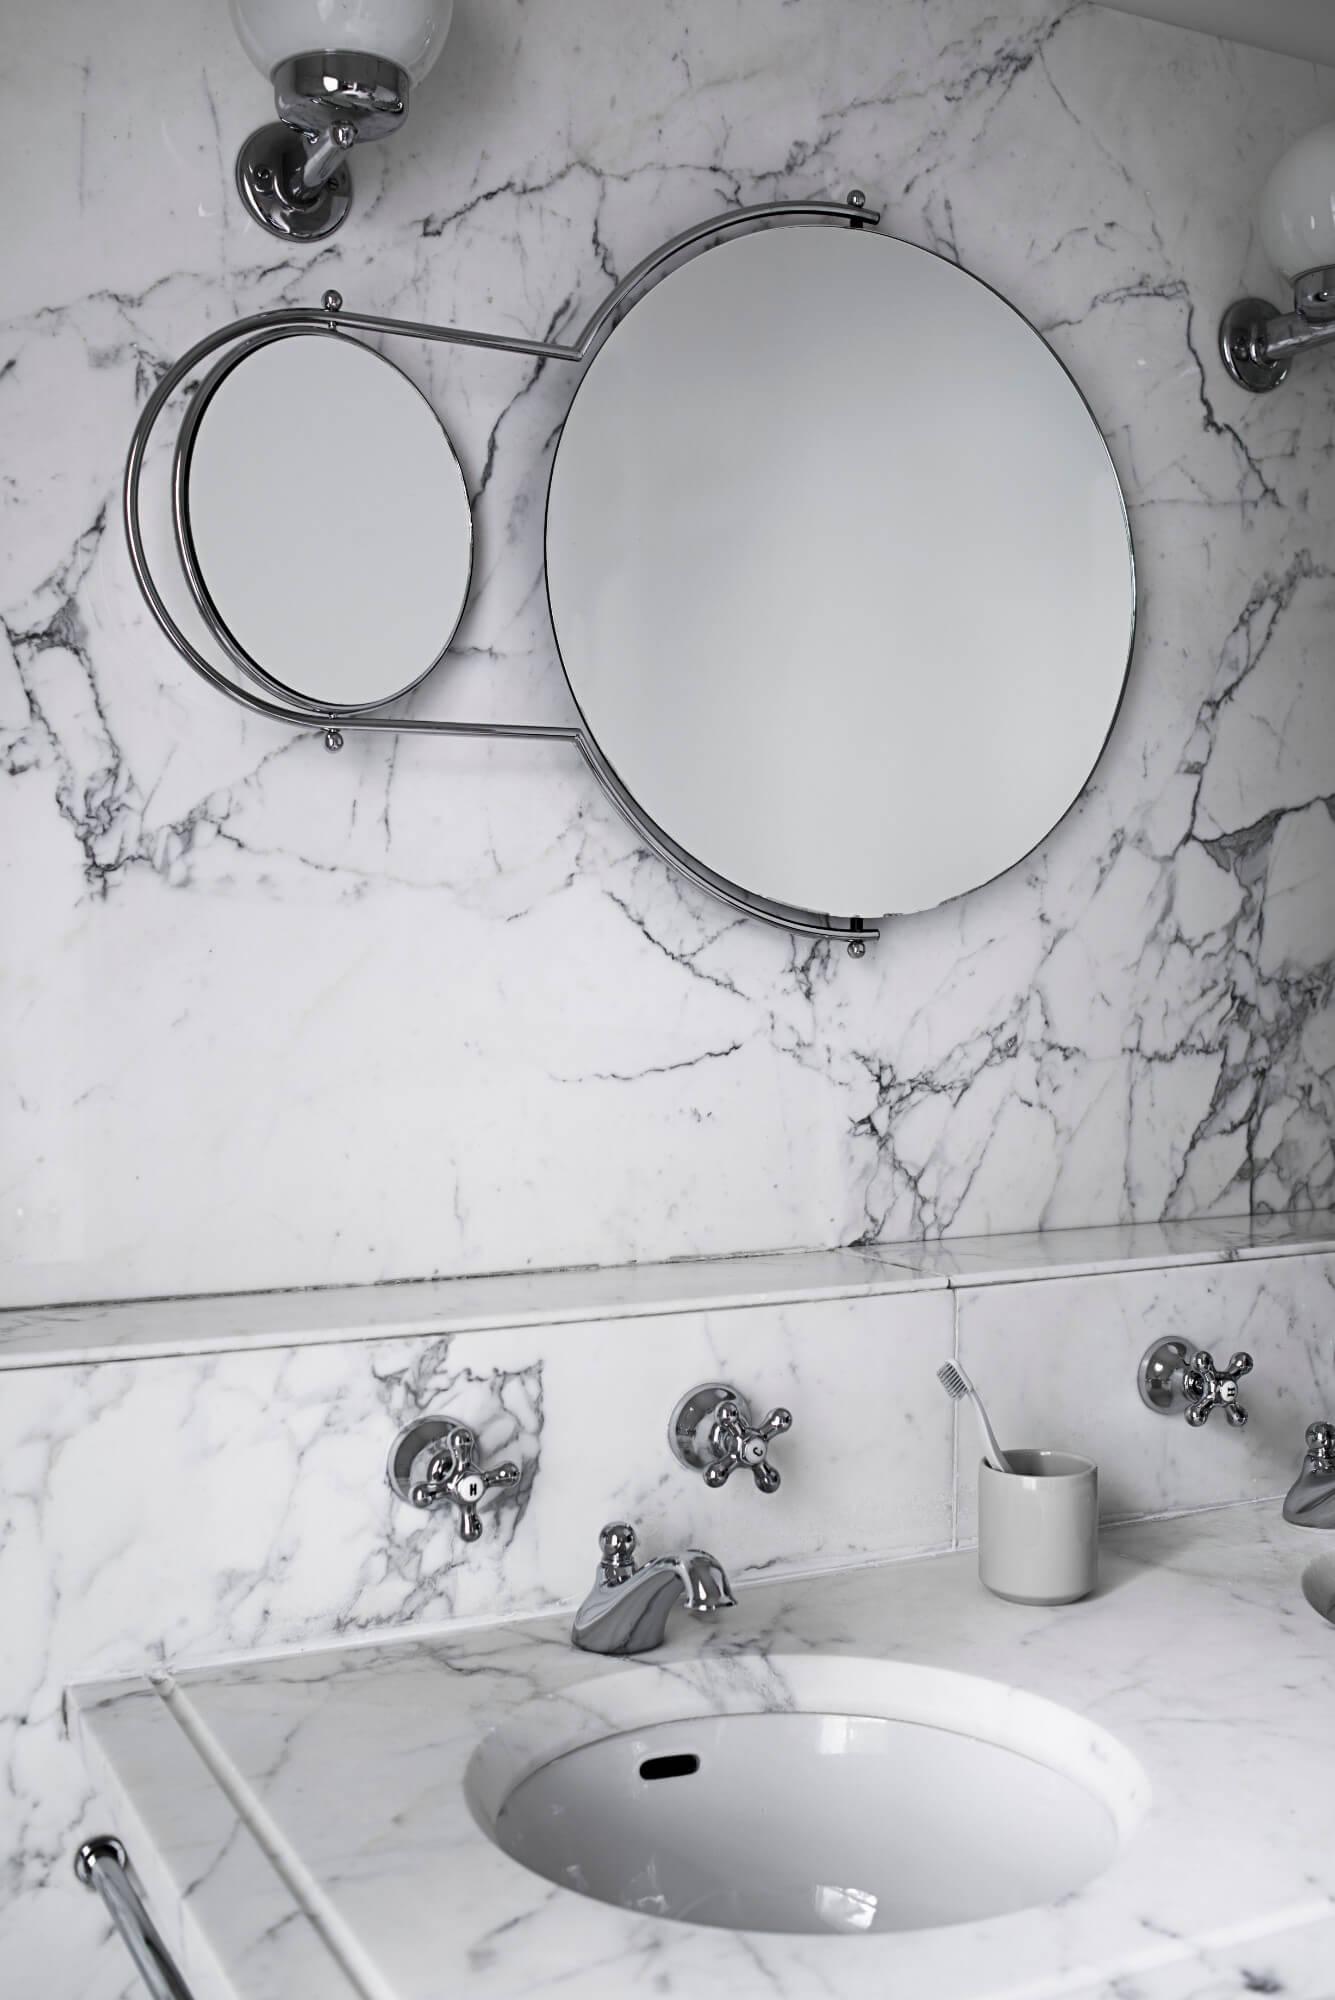 OMK 'Orbit' Mirror